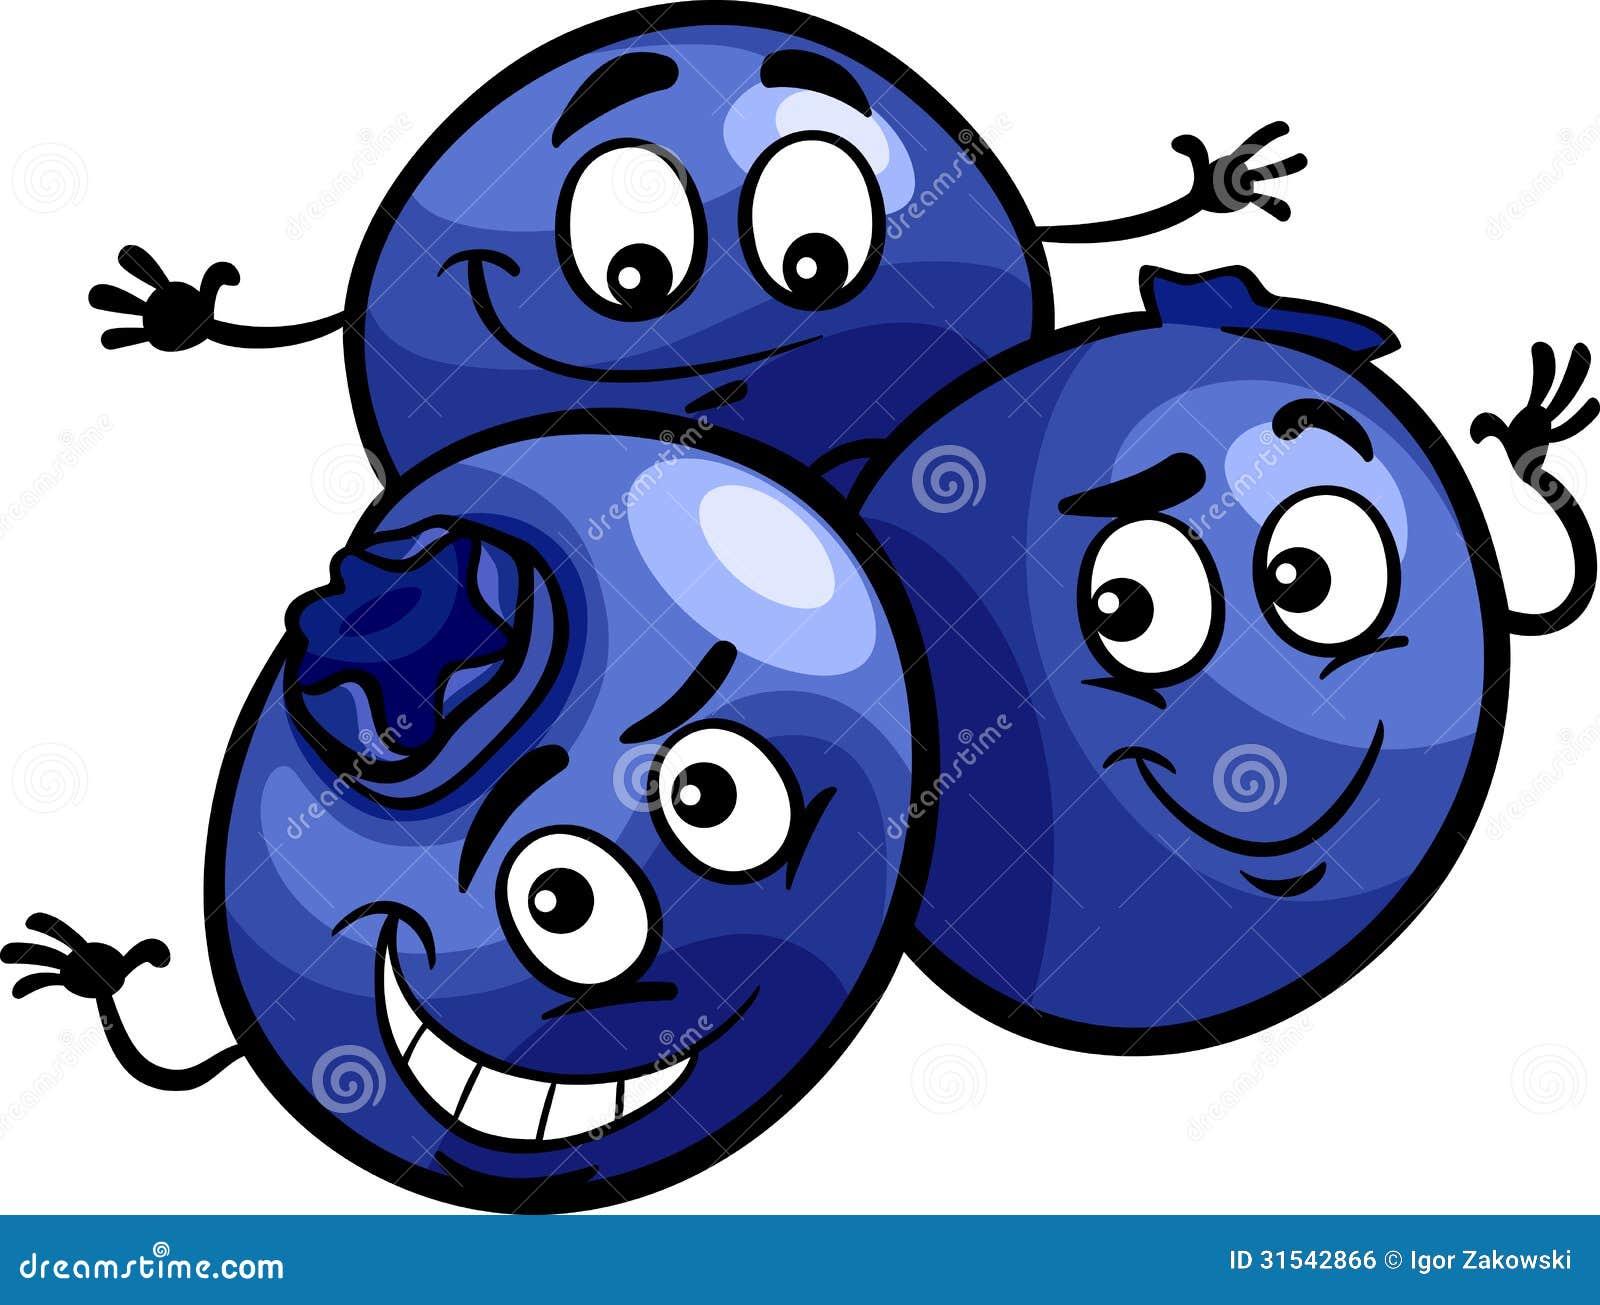 Funny Blueberry Fruits Cartoon Illustration Royalty Free ...